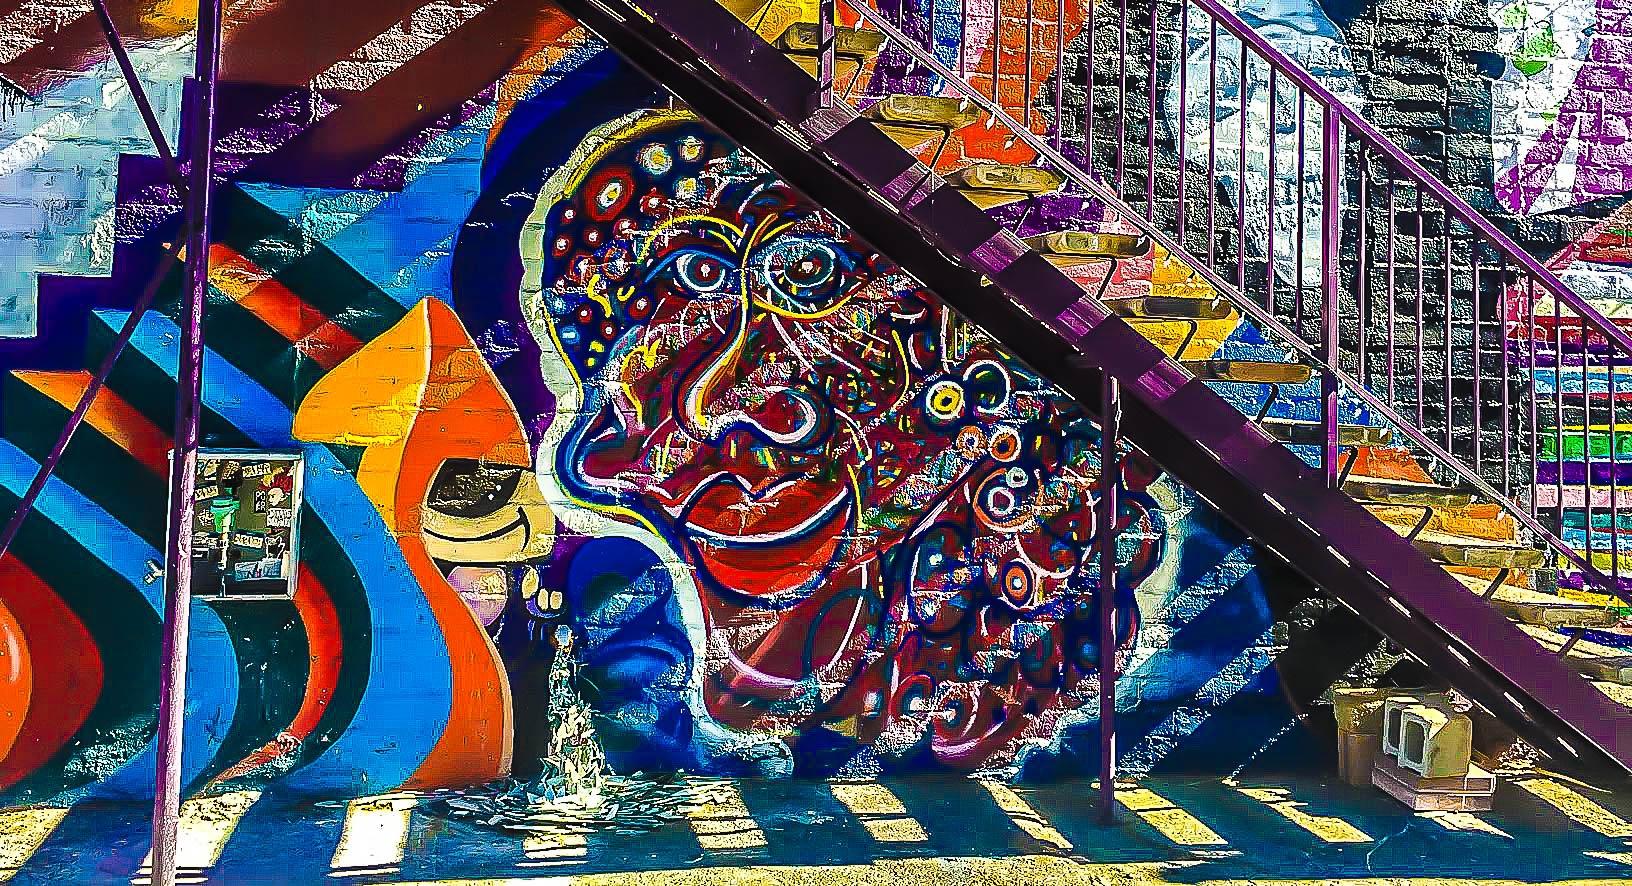 Street Art  by Theoddportrait